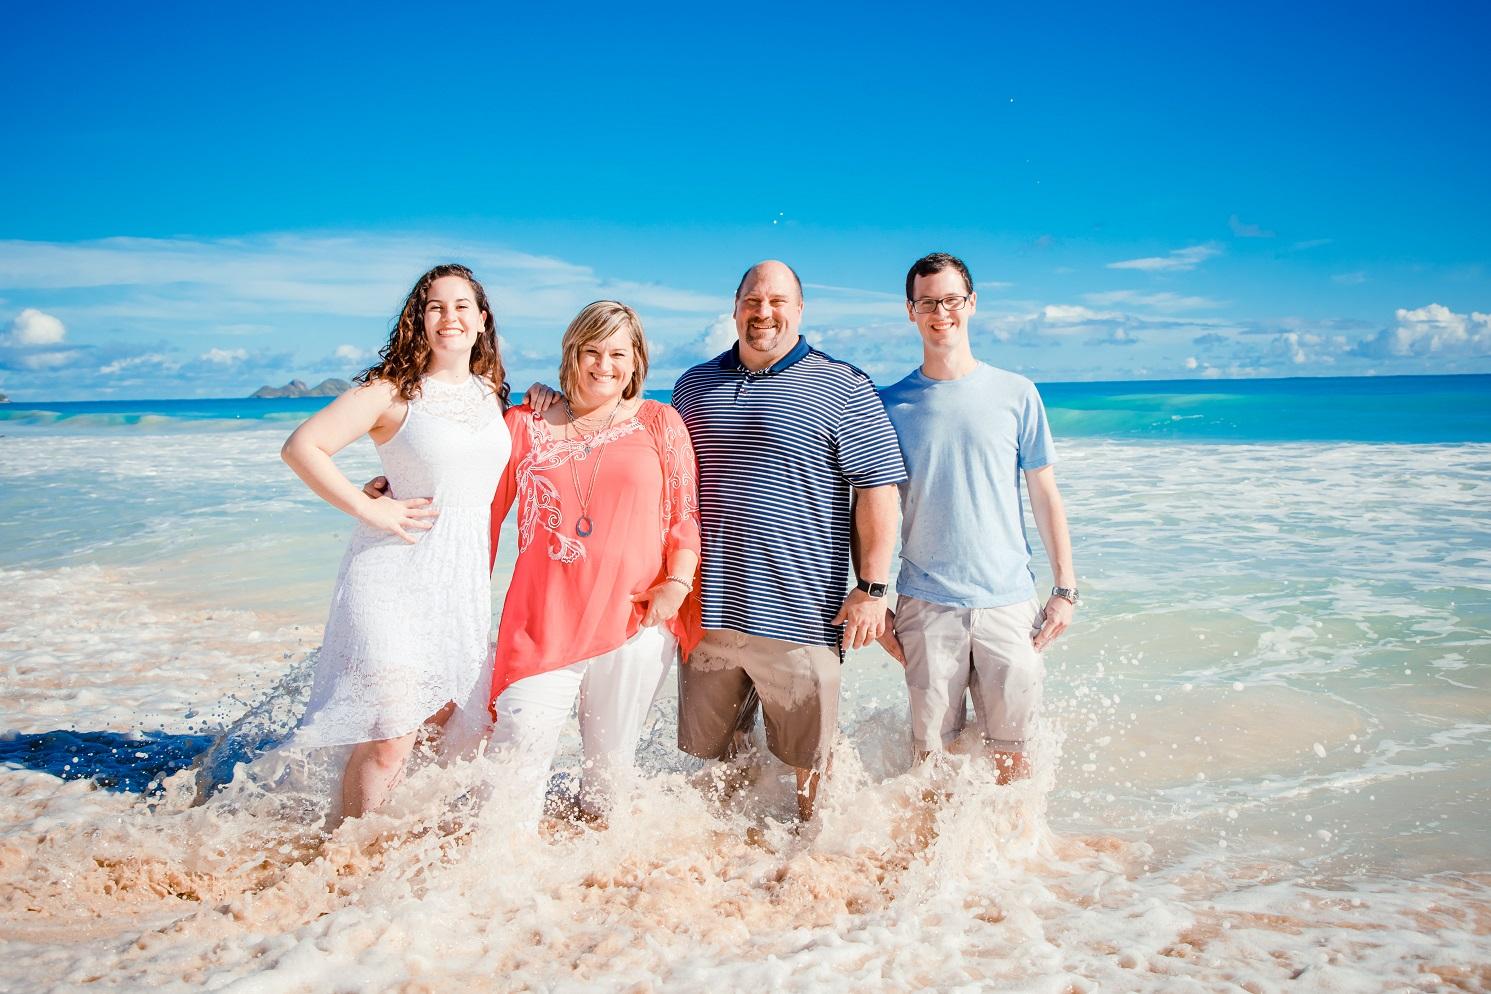 family photo ocean beach waves oahu hi